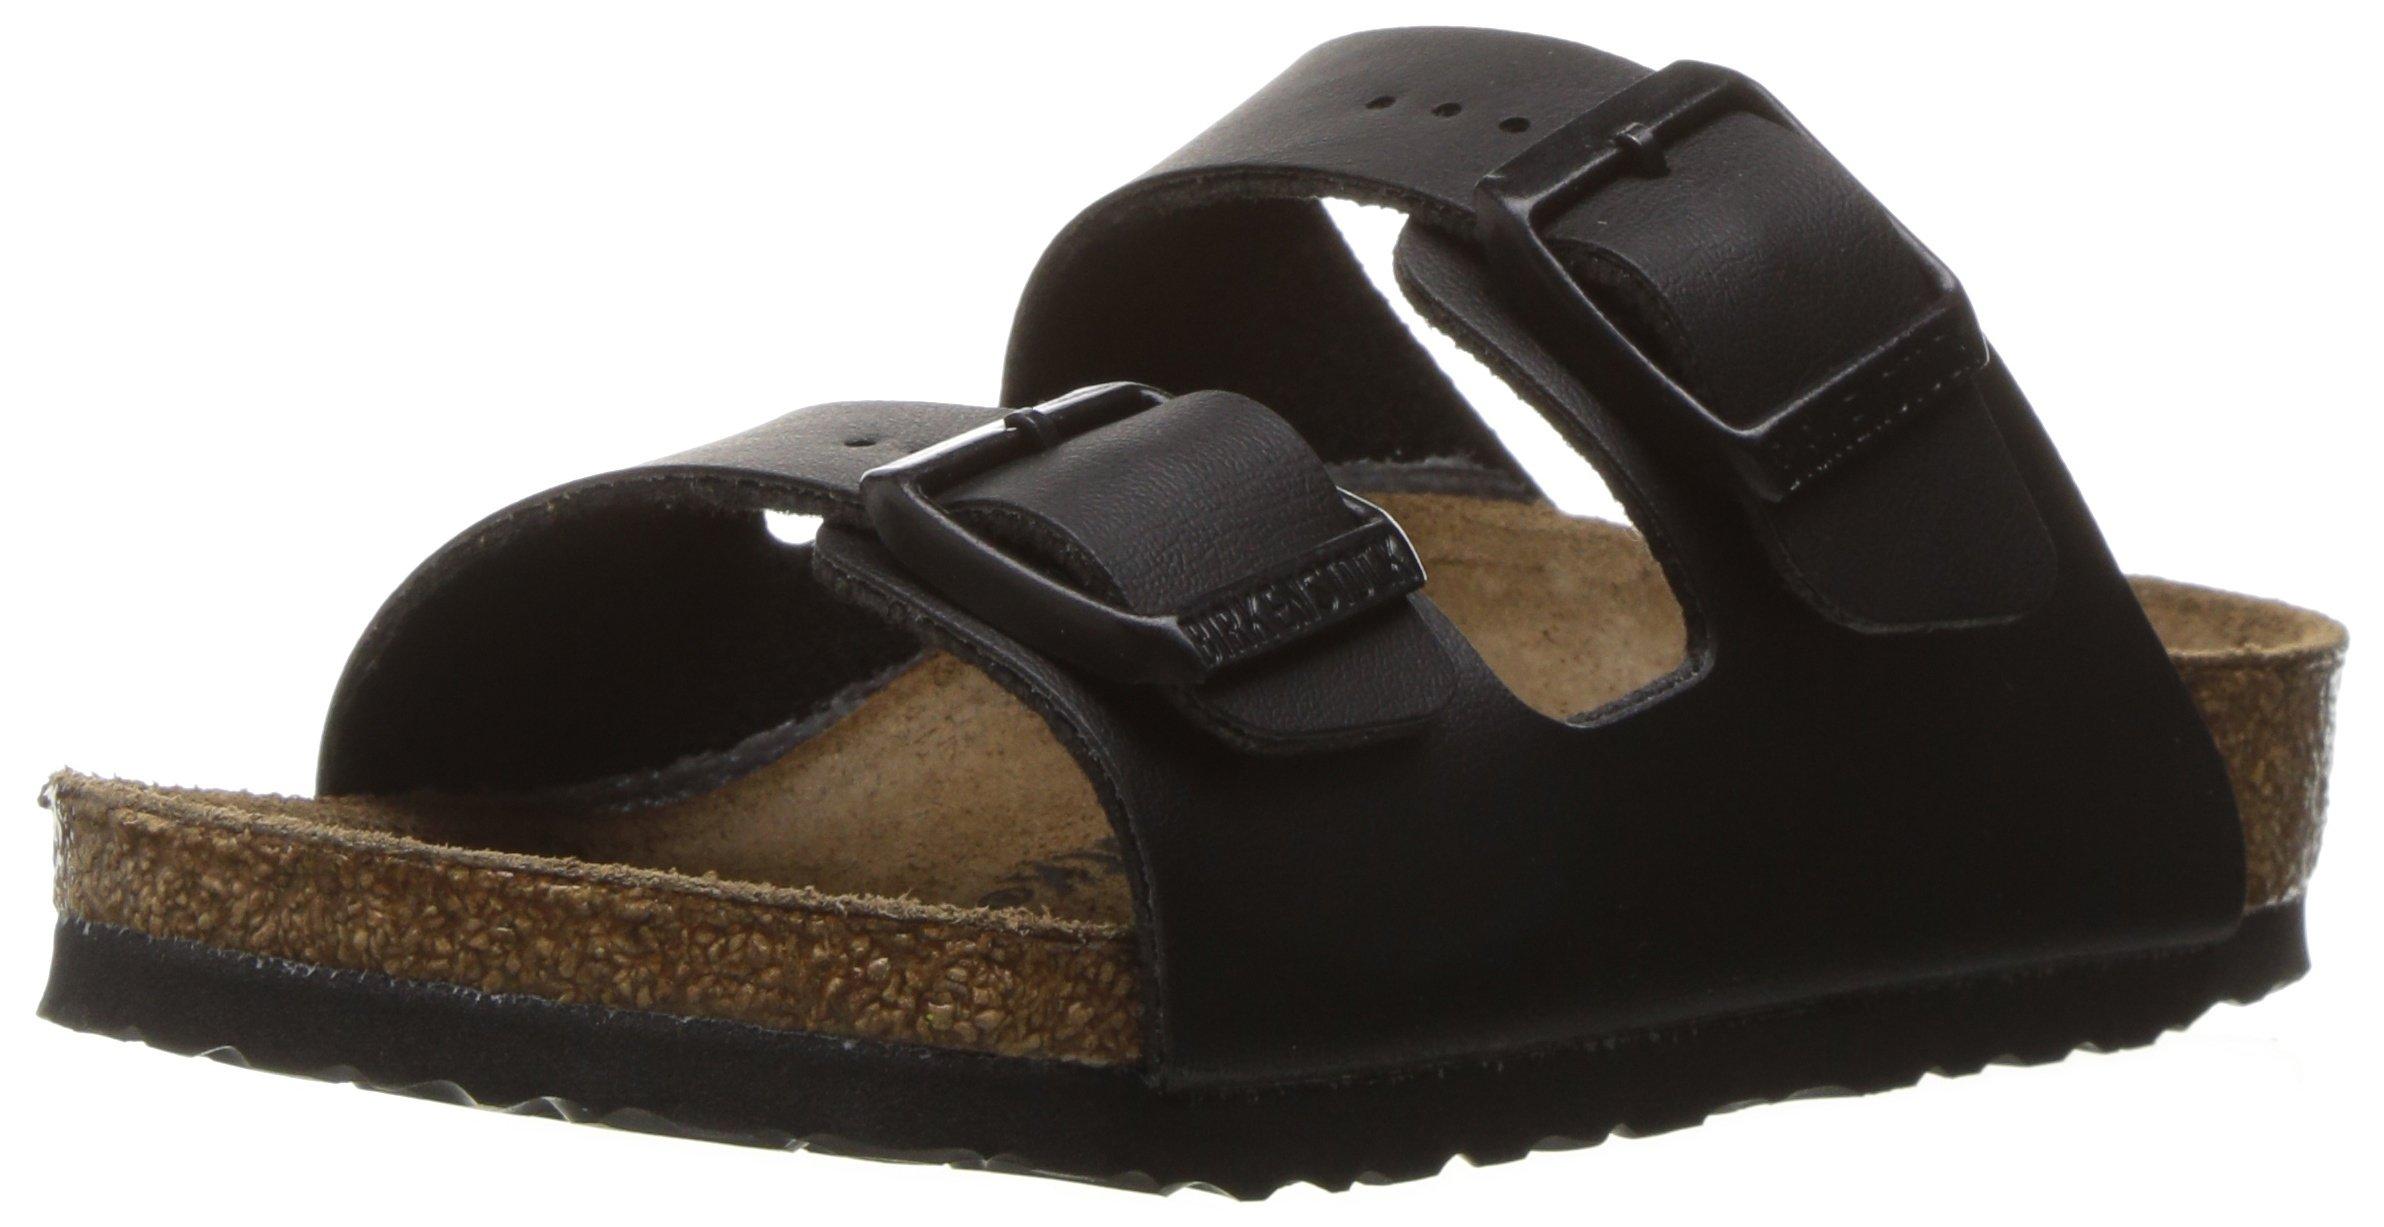 Birkenstock Arizona Birko-Flo Black Sandals - 32 M EU / 1-1.5 M US Little Kid